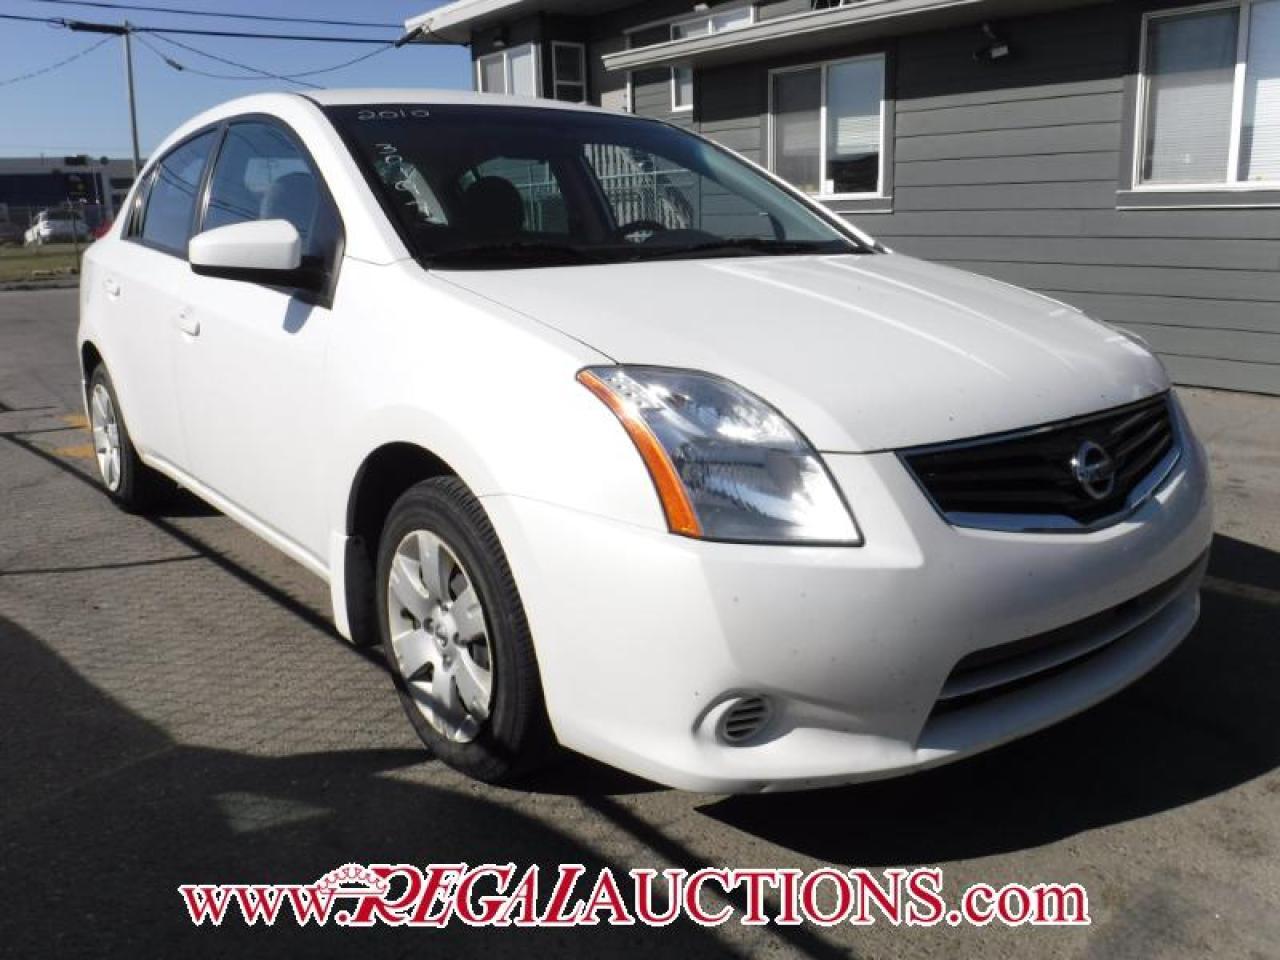 Photo of White 2010 Nissan Sentra